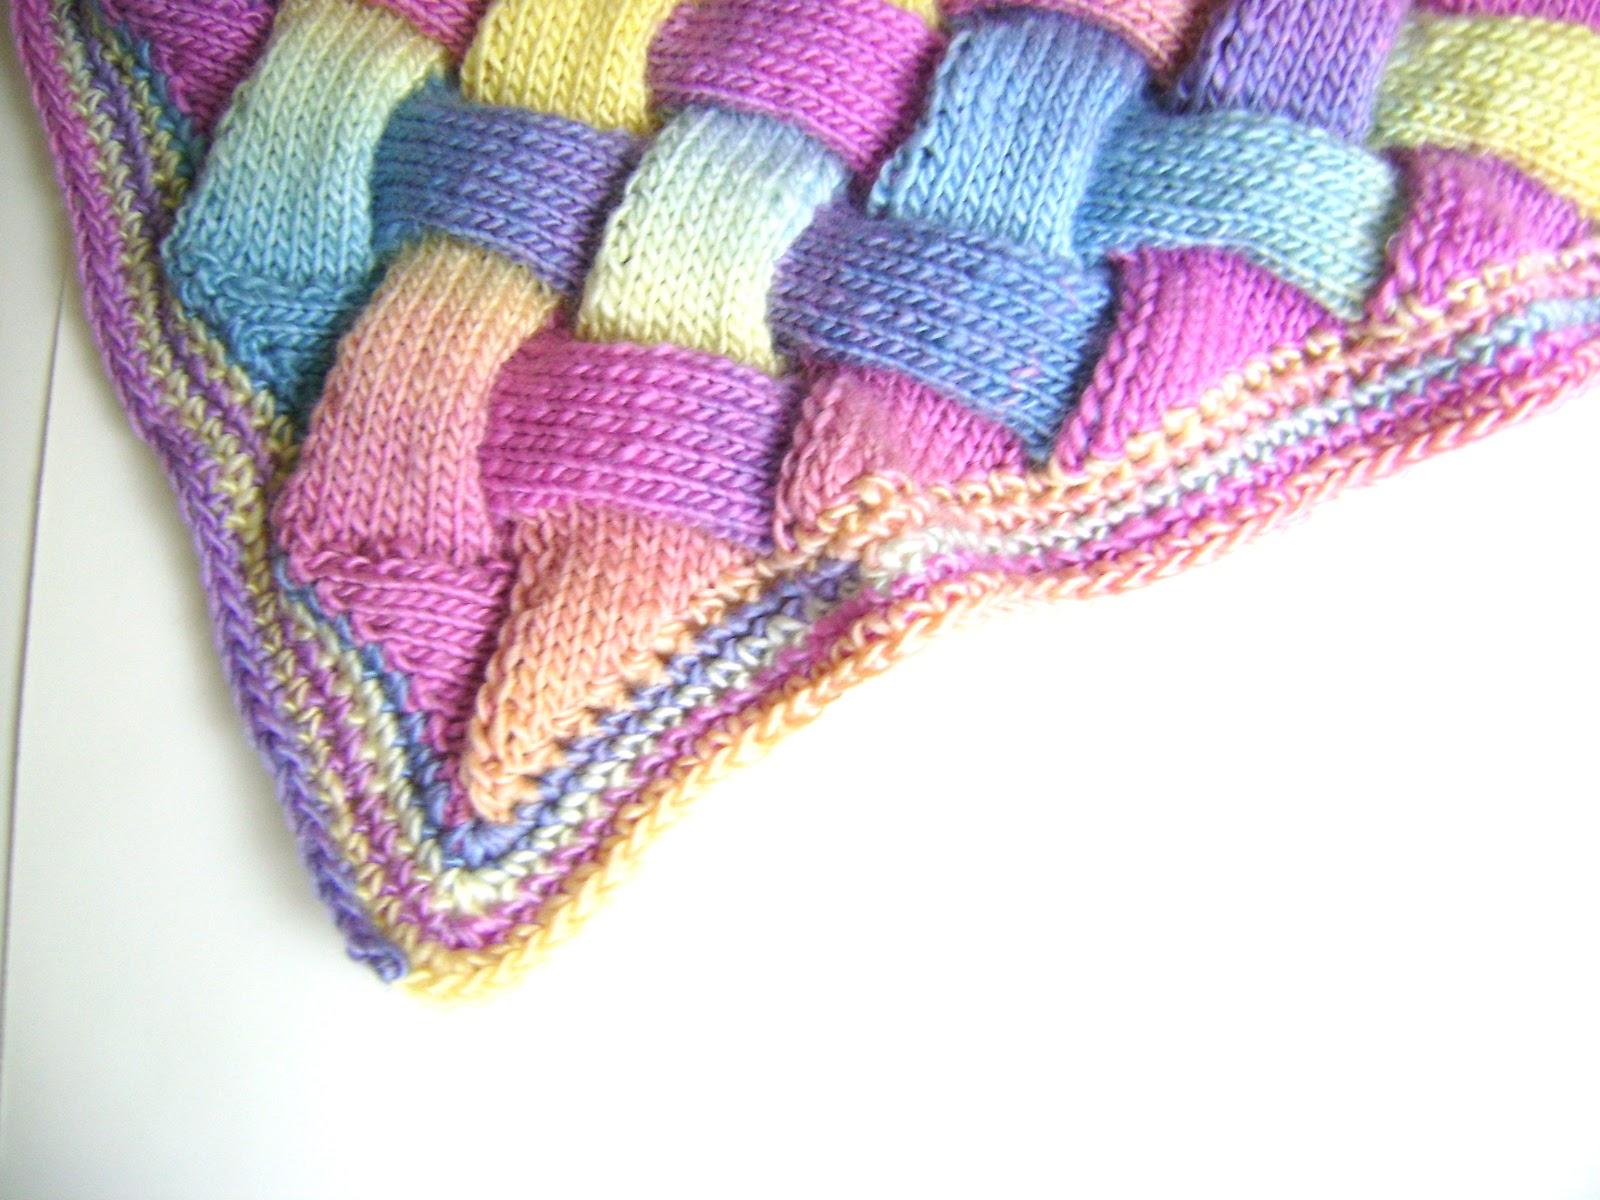 Entrelac Blanket Knitting Pattern : Creative Designs by Sheila Zachariae: Rainbow Entrelac Blanket